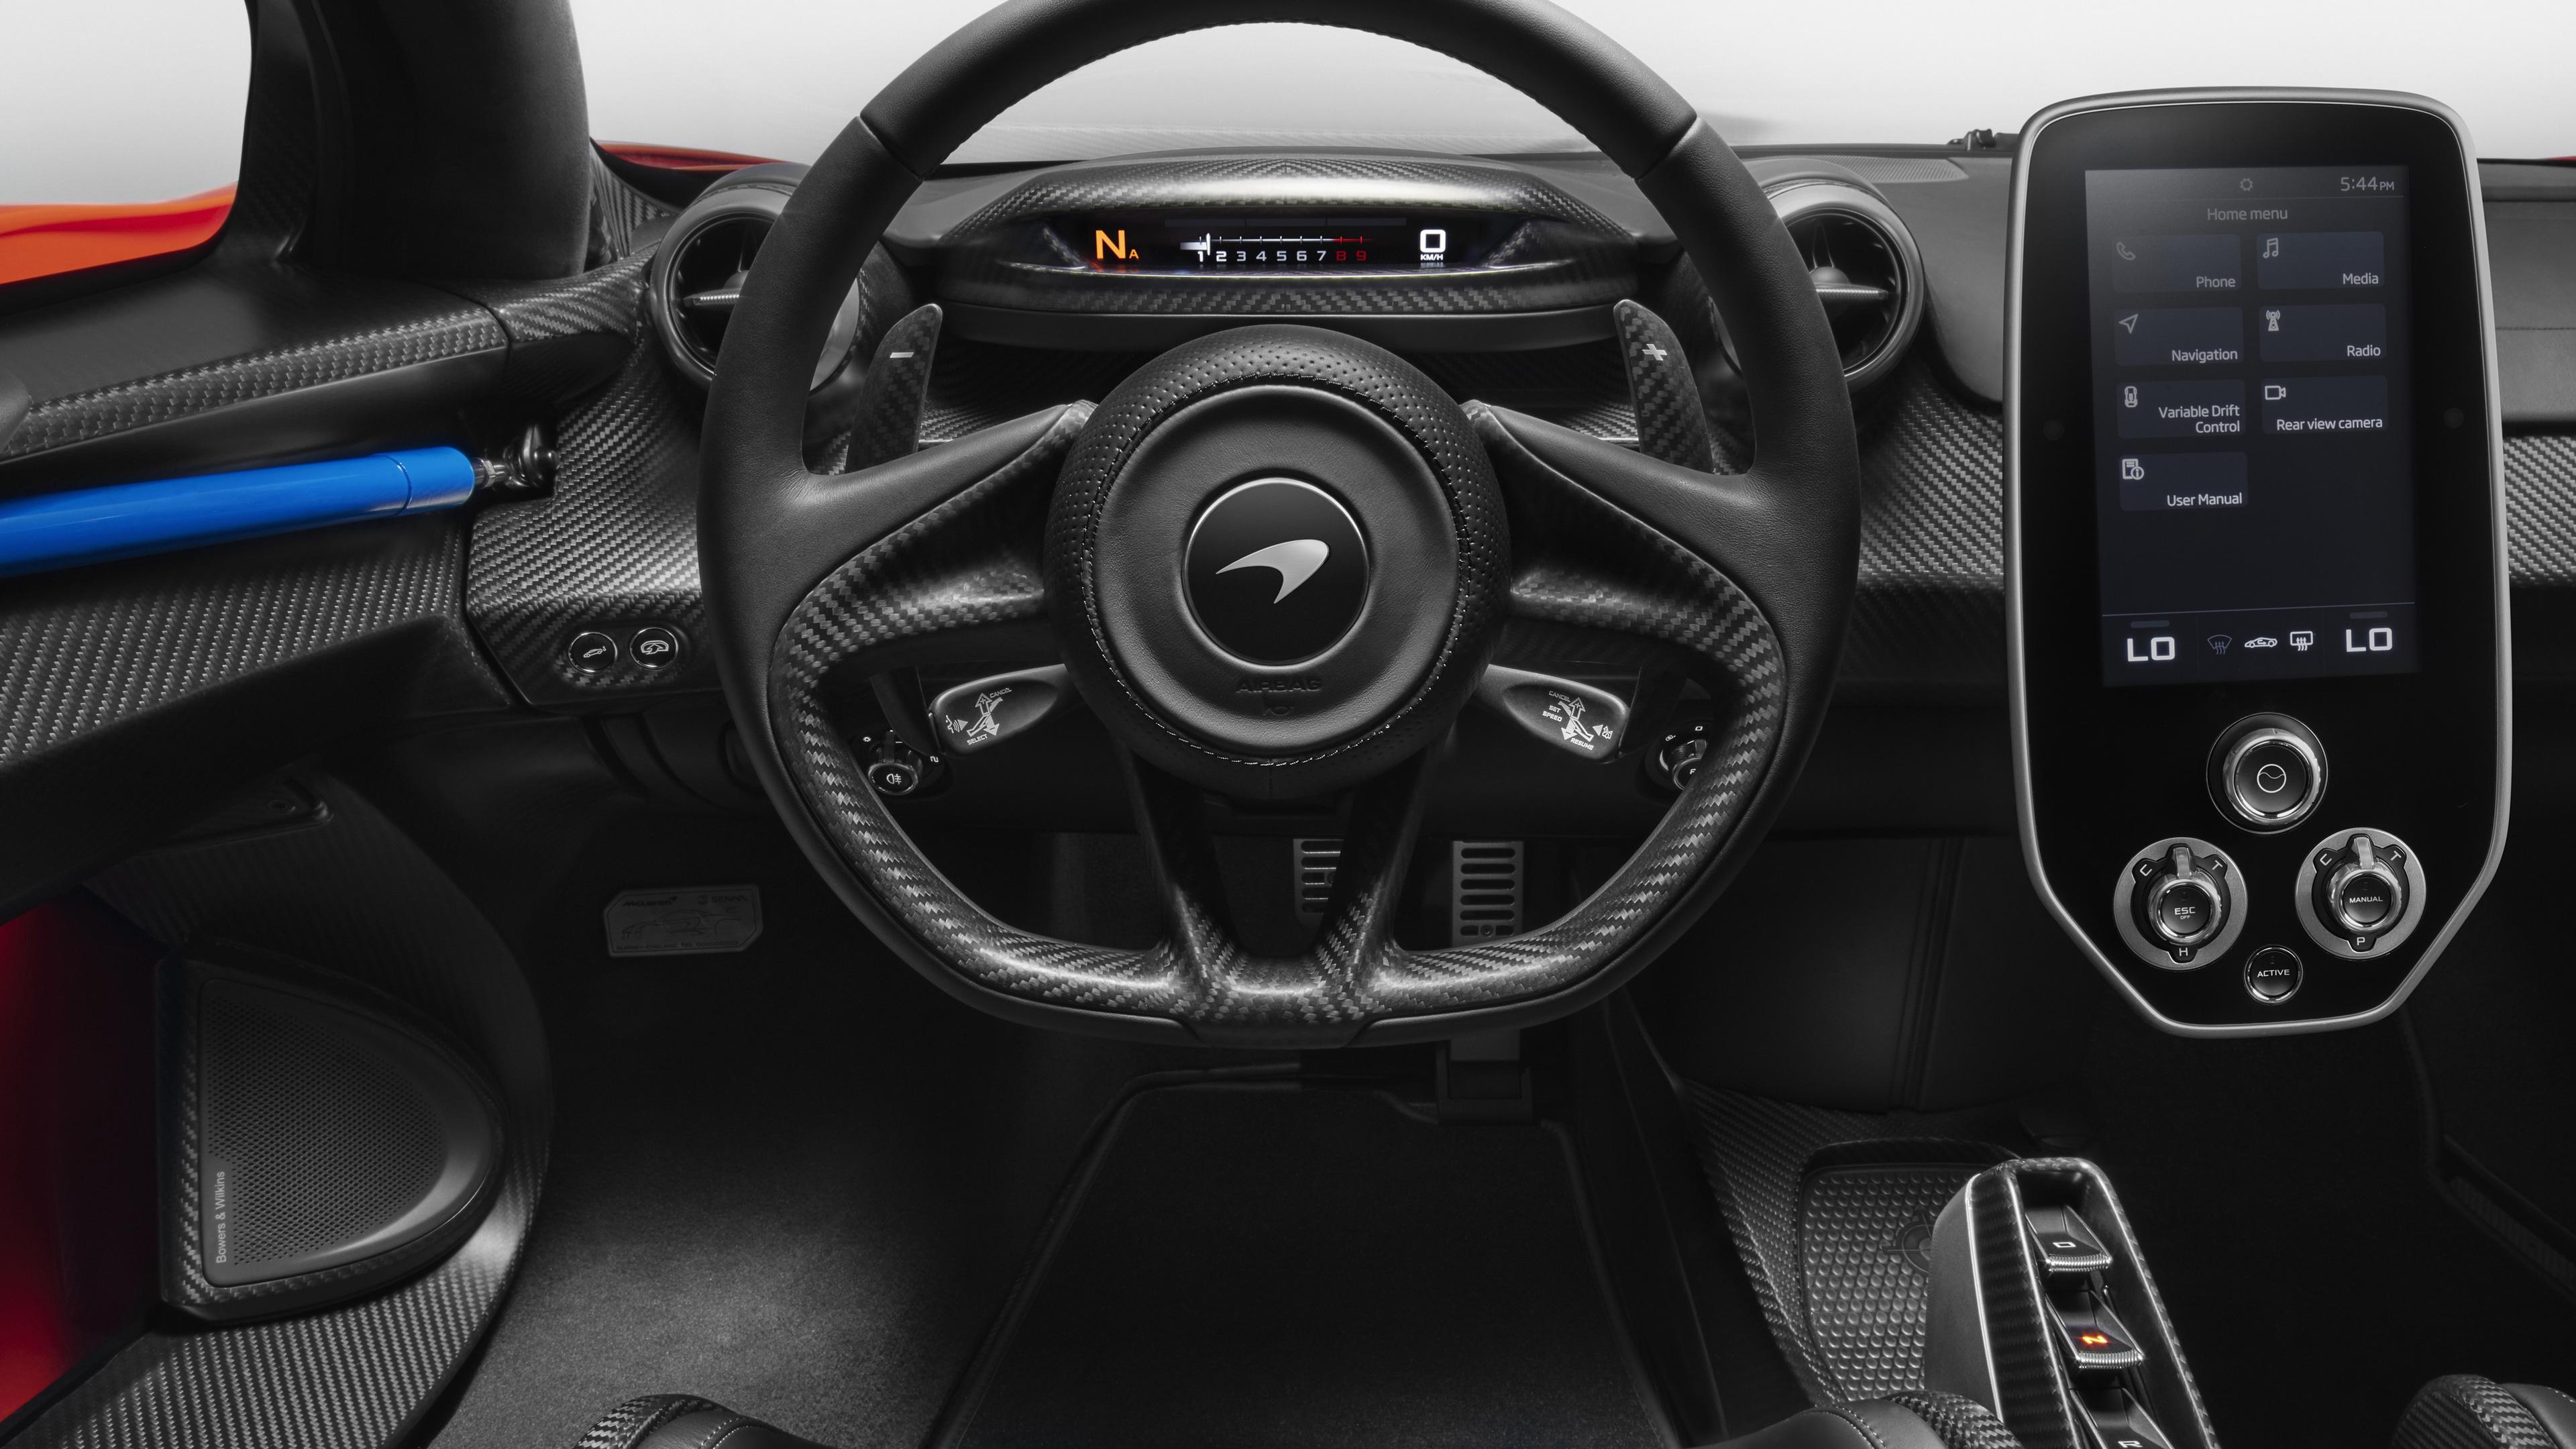 mclaren senna car interior 4k 1539108681 - Mclaren Senna Car Interior 4k - steering wallpapers, mclaren wallpapers, mclaren senna wallpapers, interior wallpapers, hd-wallpapers, 4k-wallpapers, 2018 cars wallpapers